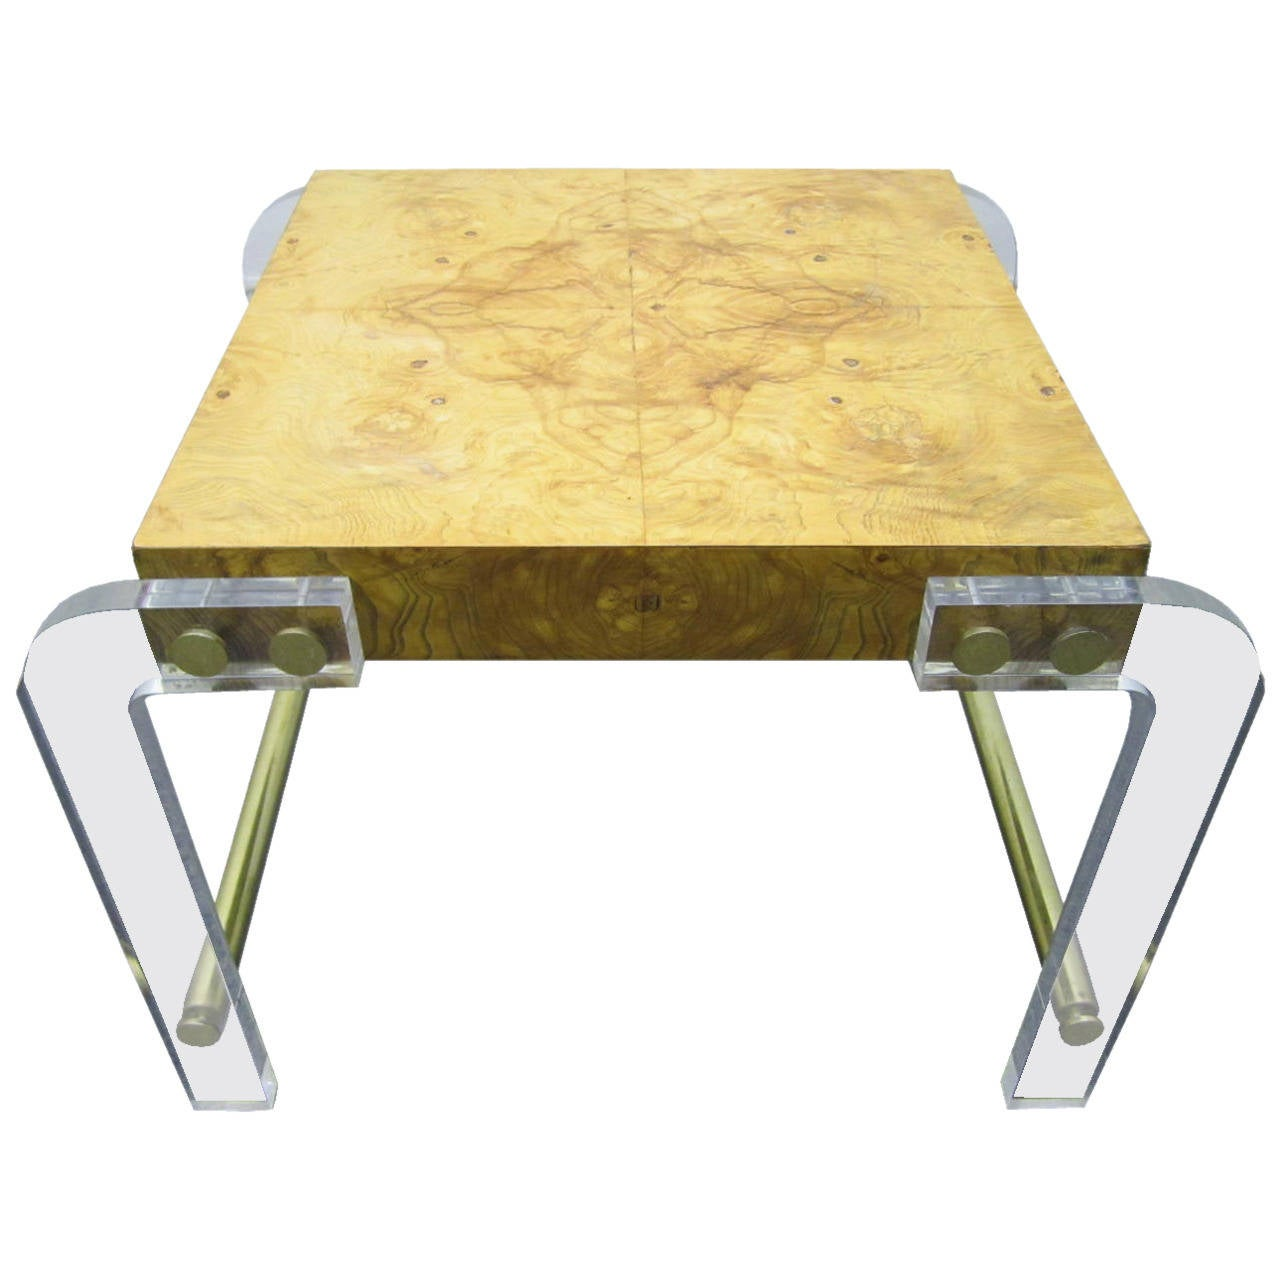 milo baughman lucite and olive ash burl side end table midcentury  - milo baughman lucite and olive ash burl side end table midcentury modern